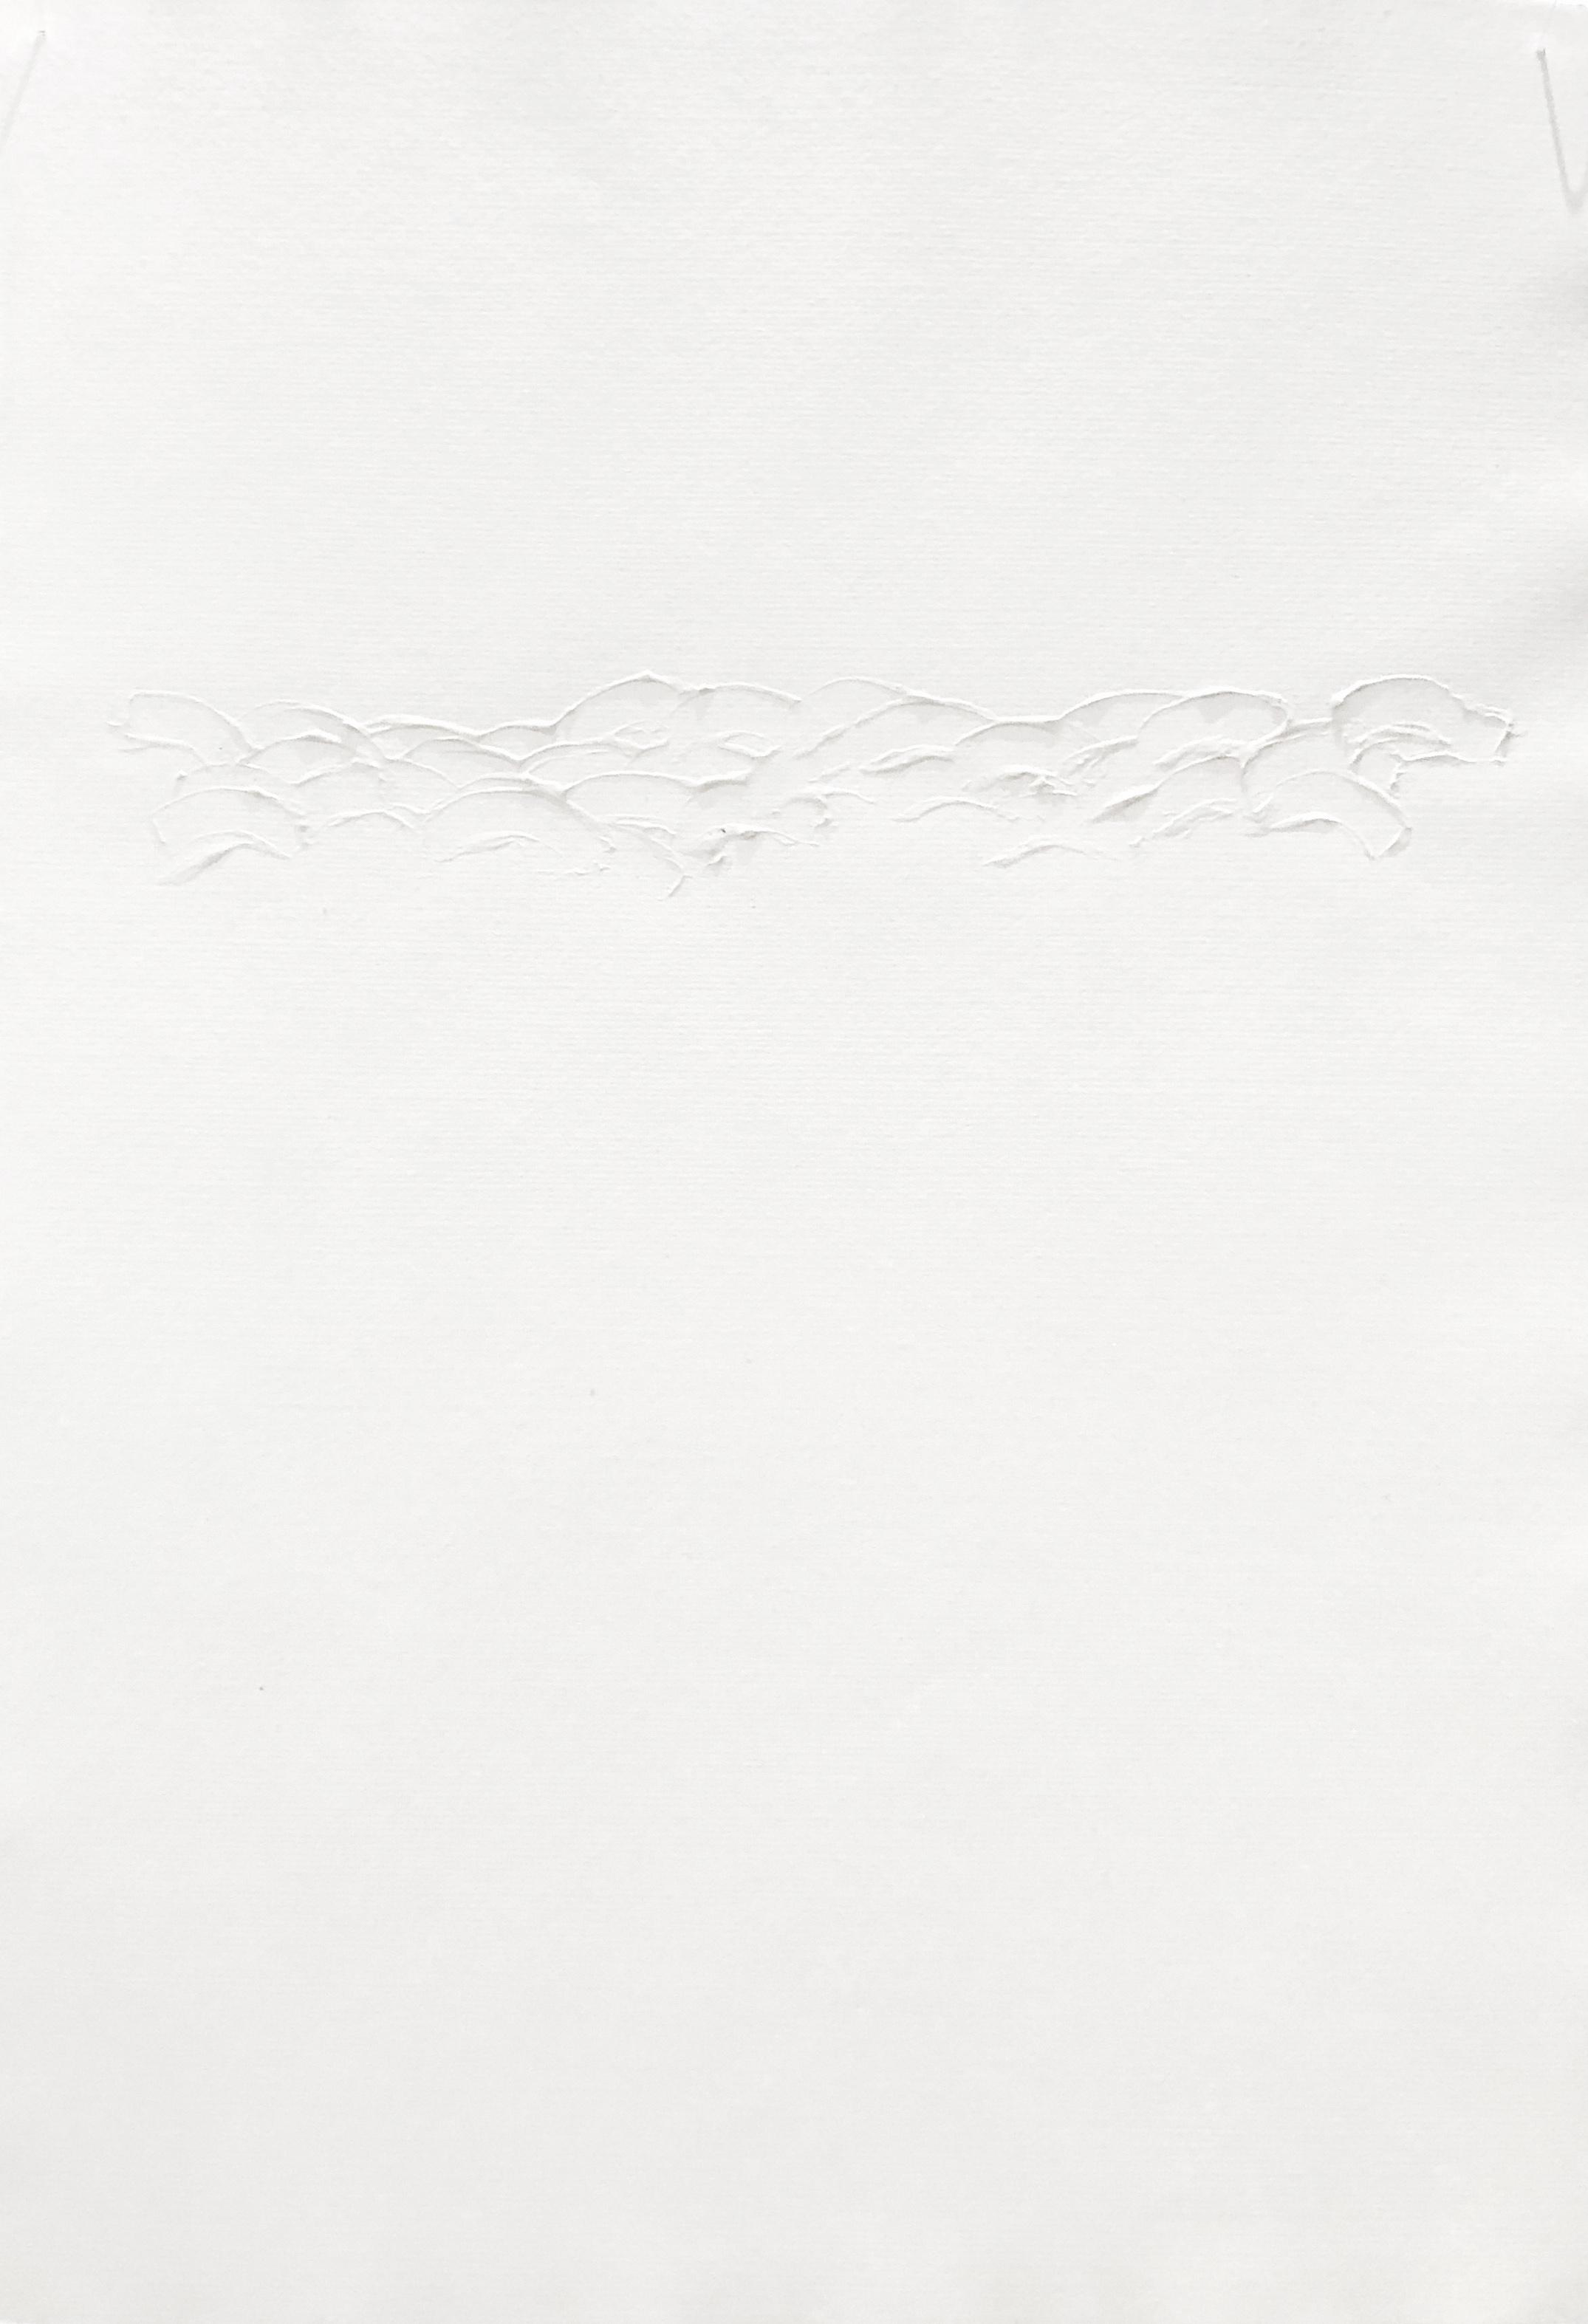 Sharon Louden,  Merge , 2001, Acrylic, gel medium and watercolor on mylar, 18 x 11 inches (45.7 x 28 cm)